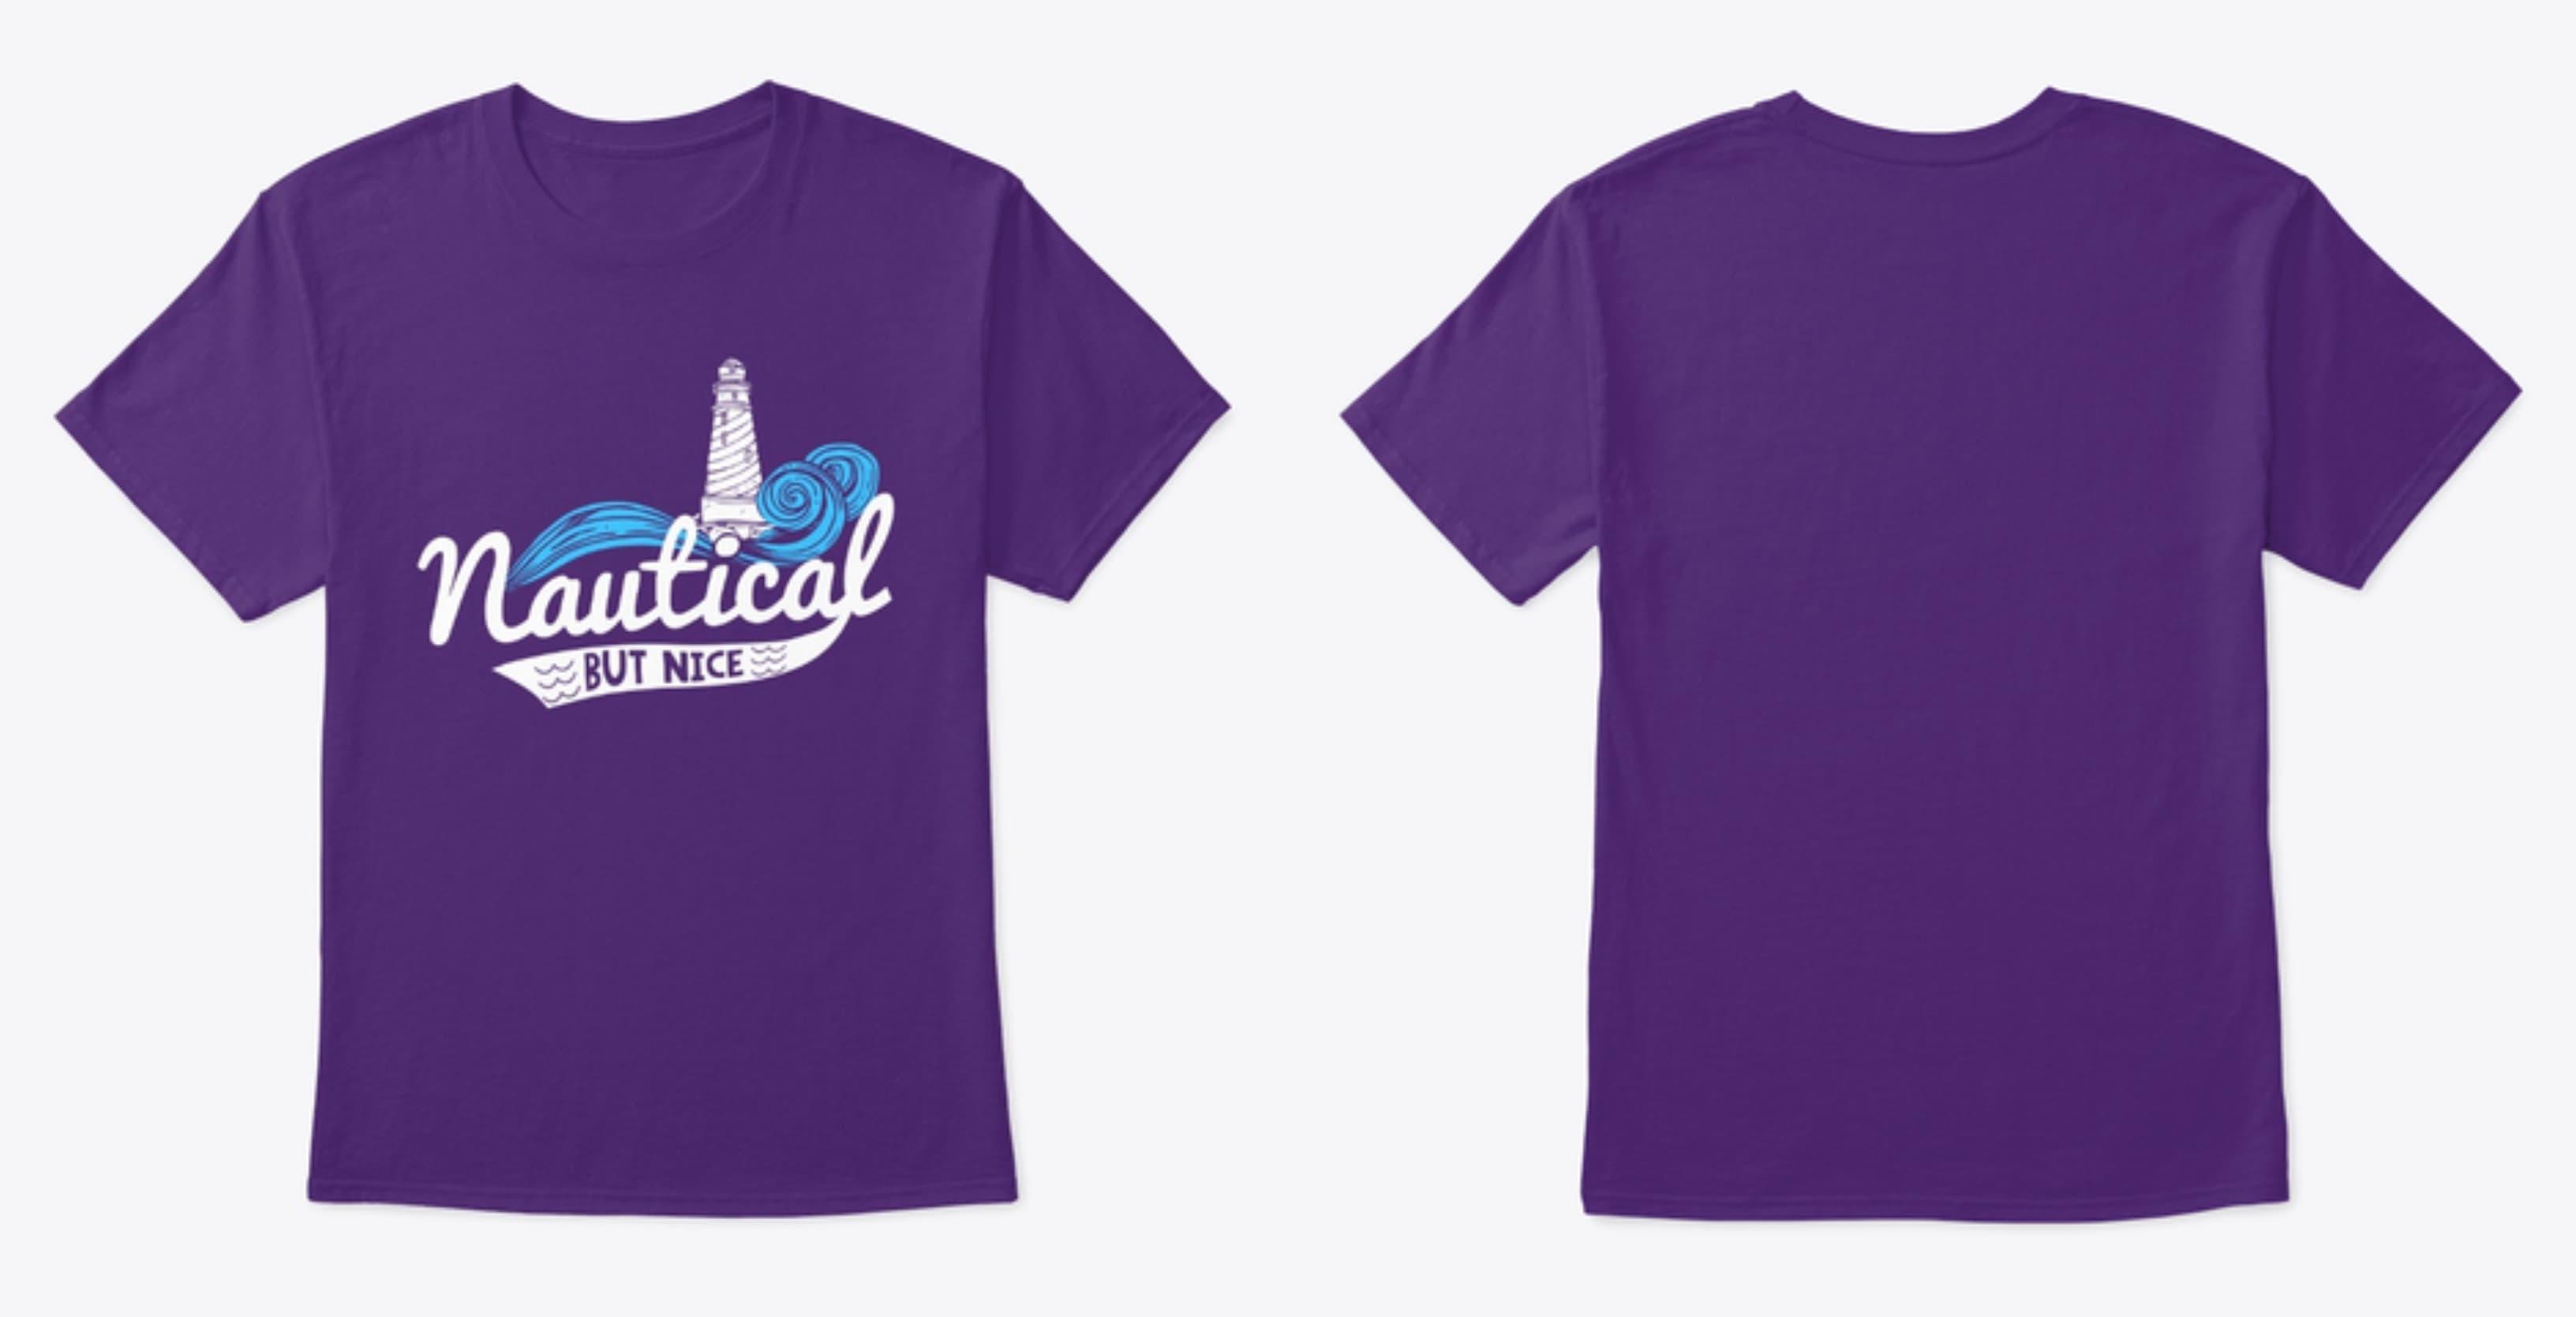 Funny Cruise Tshirt. Nautical by Nice.